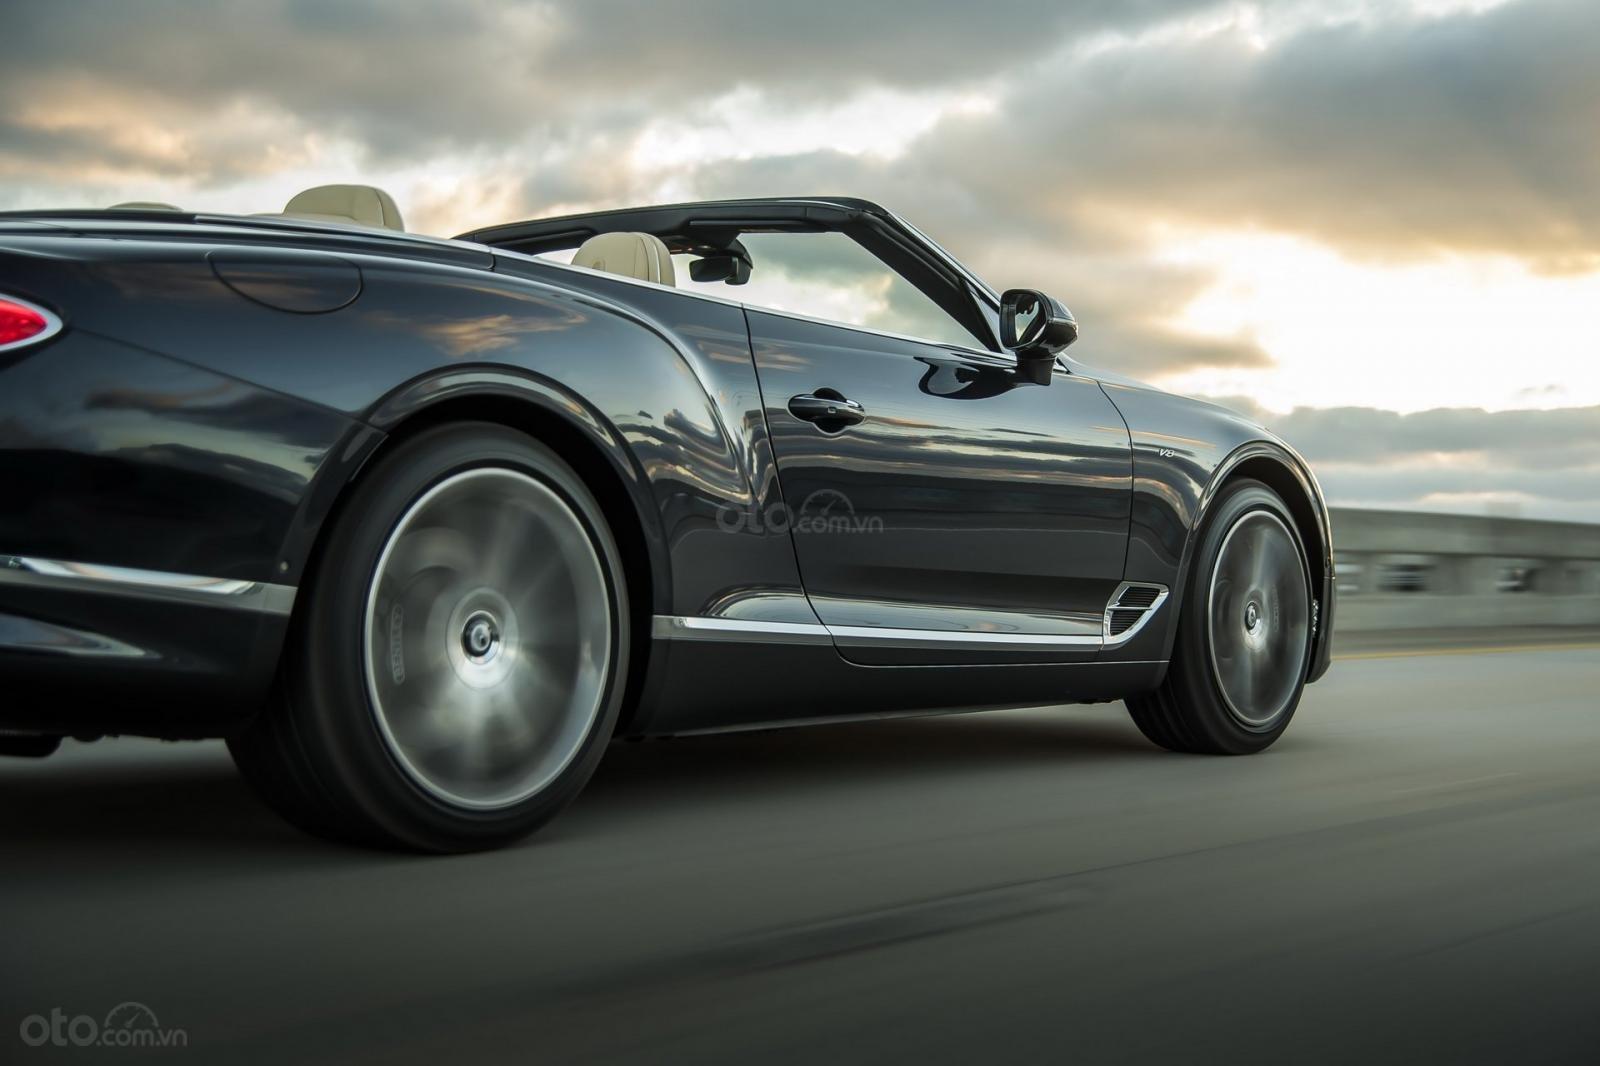 Bentley Continental GT 2020 khoe dáng - 6